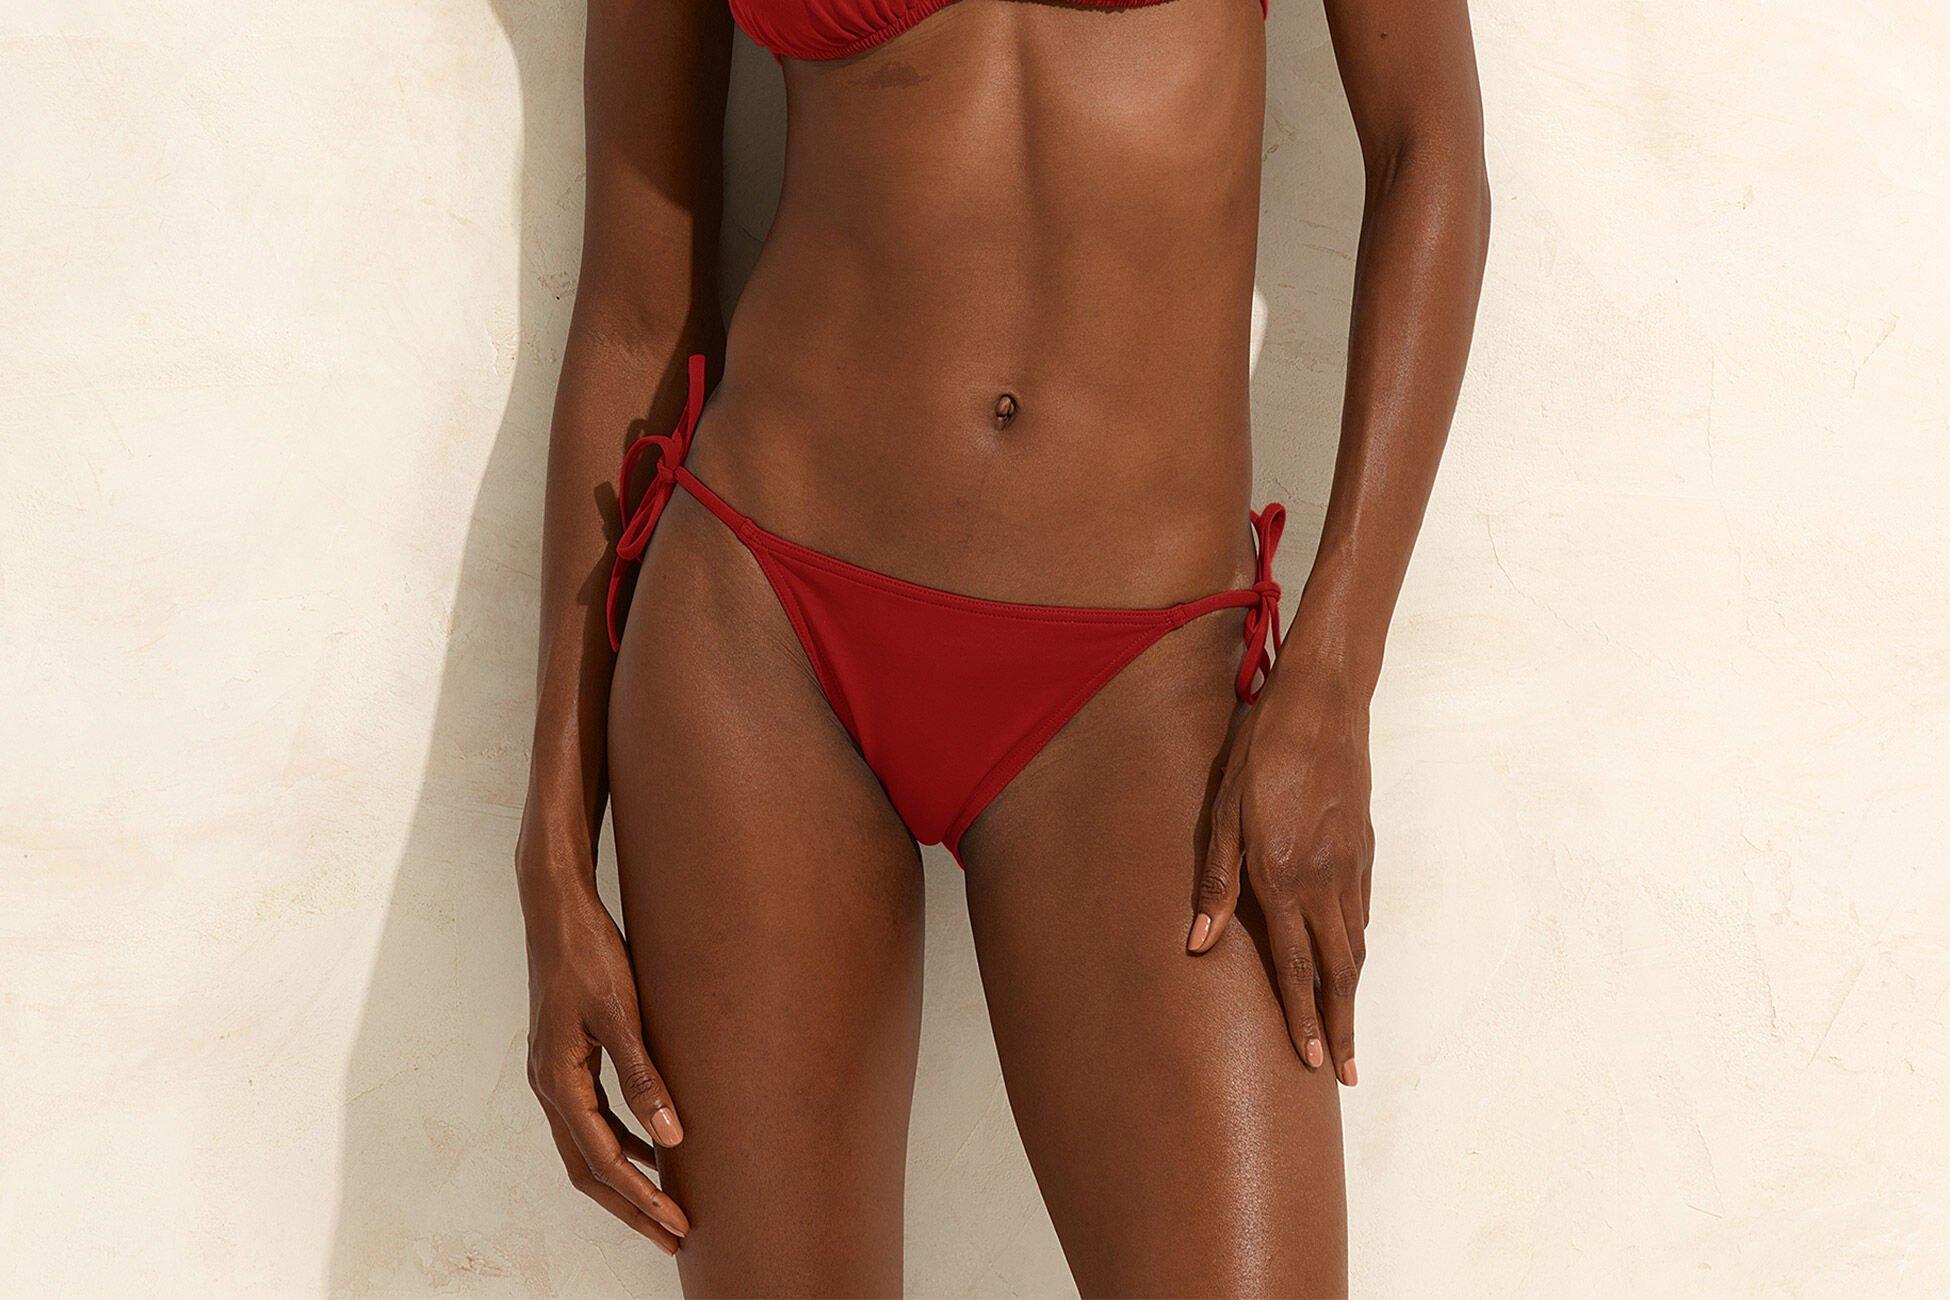 Malou Thin bikini briefs standard view �